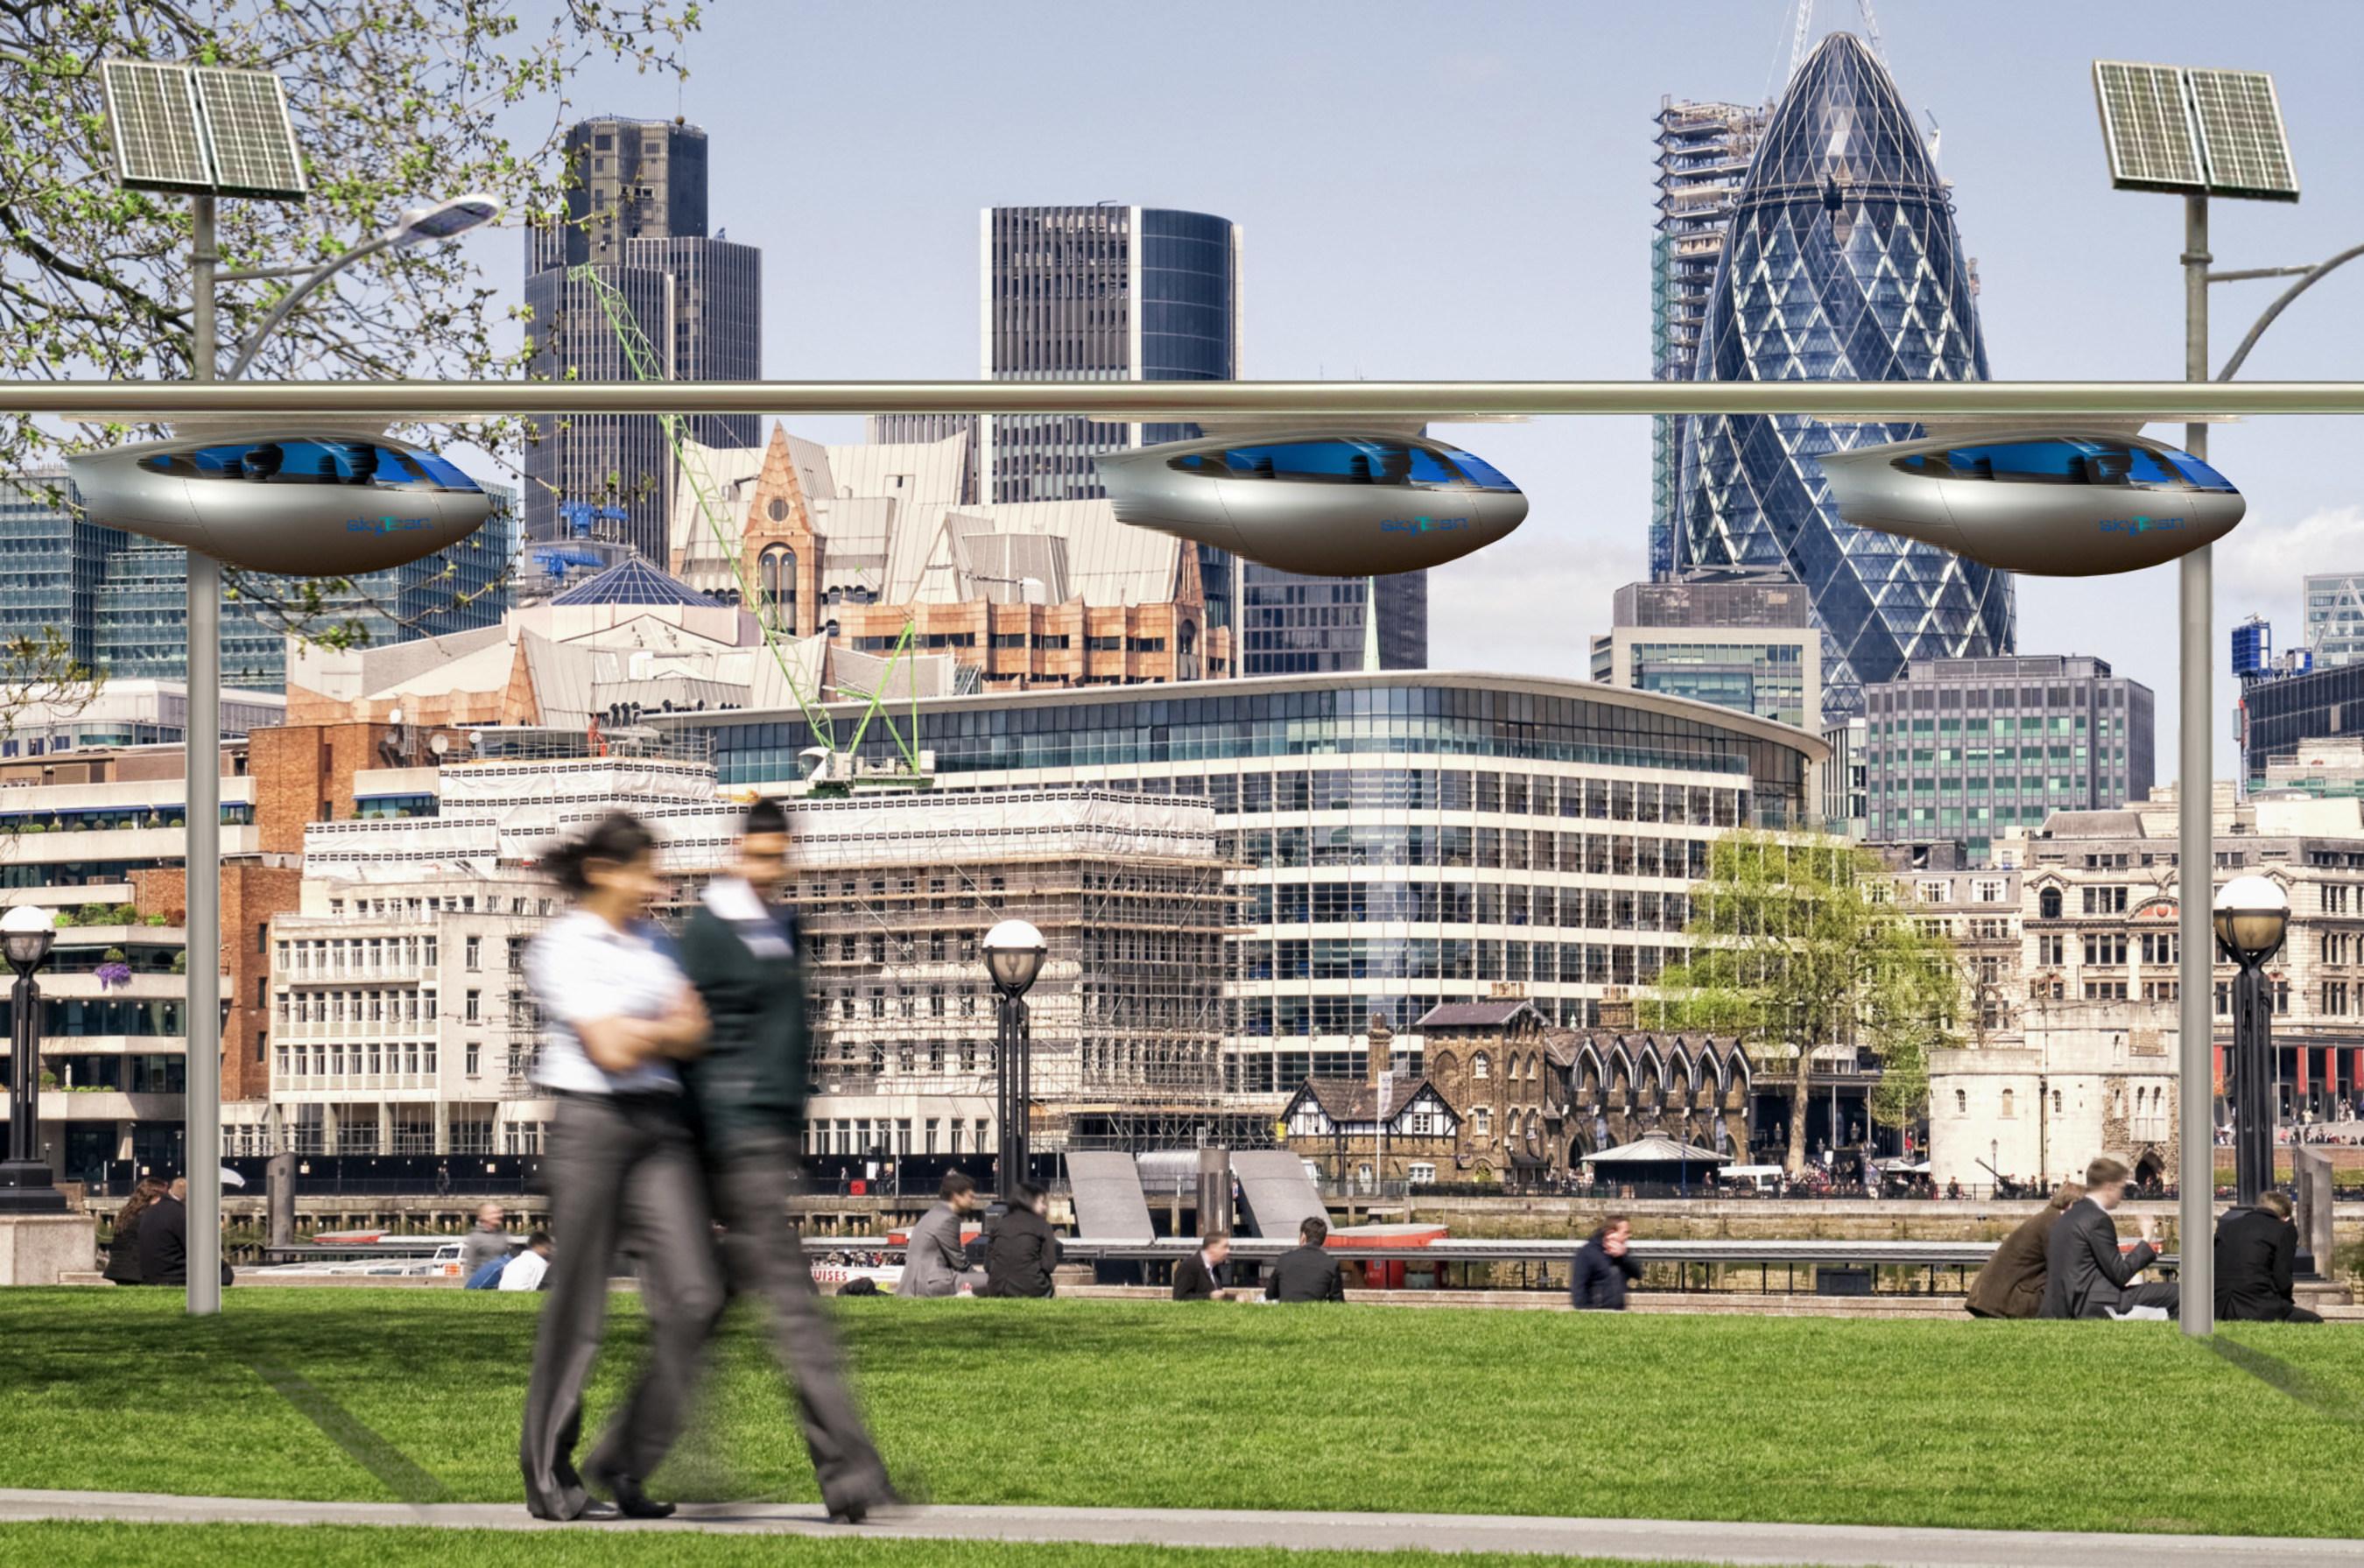 skyTran Announces Innovation Endeavors Investment